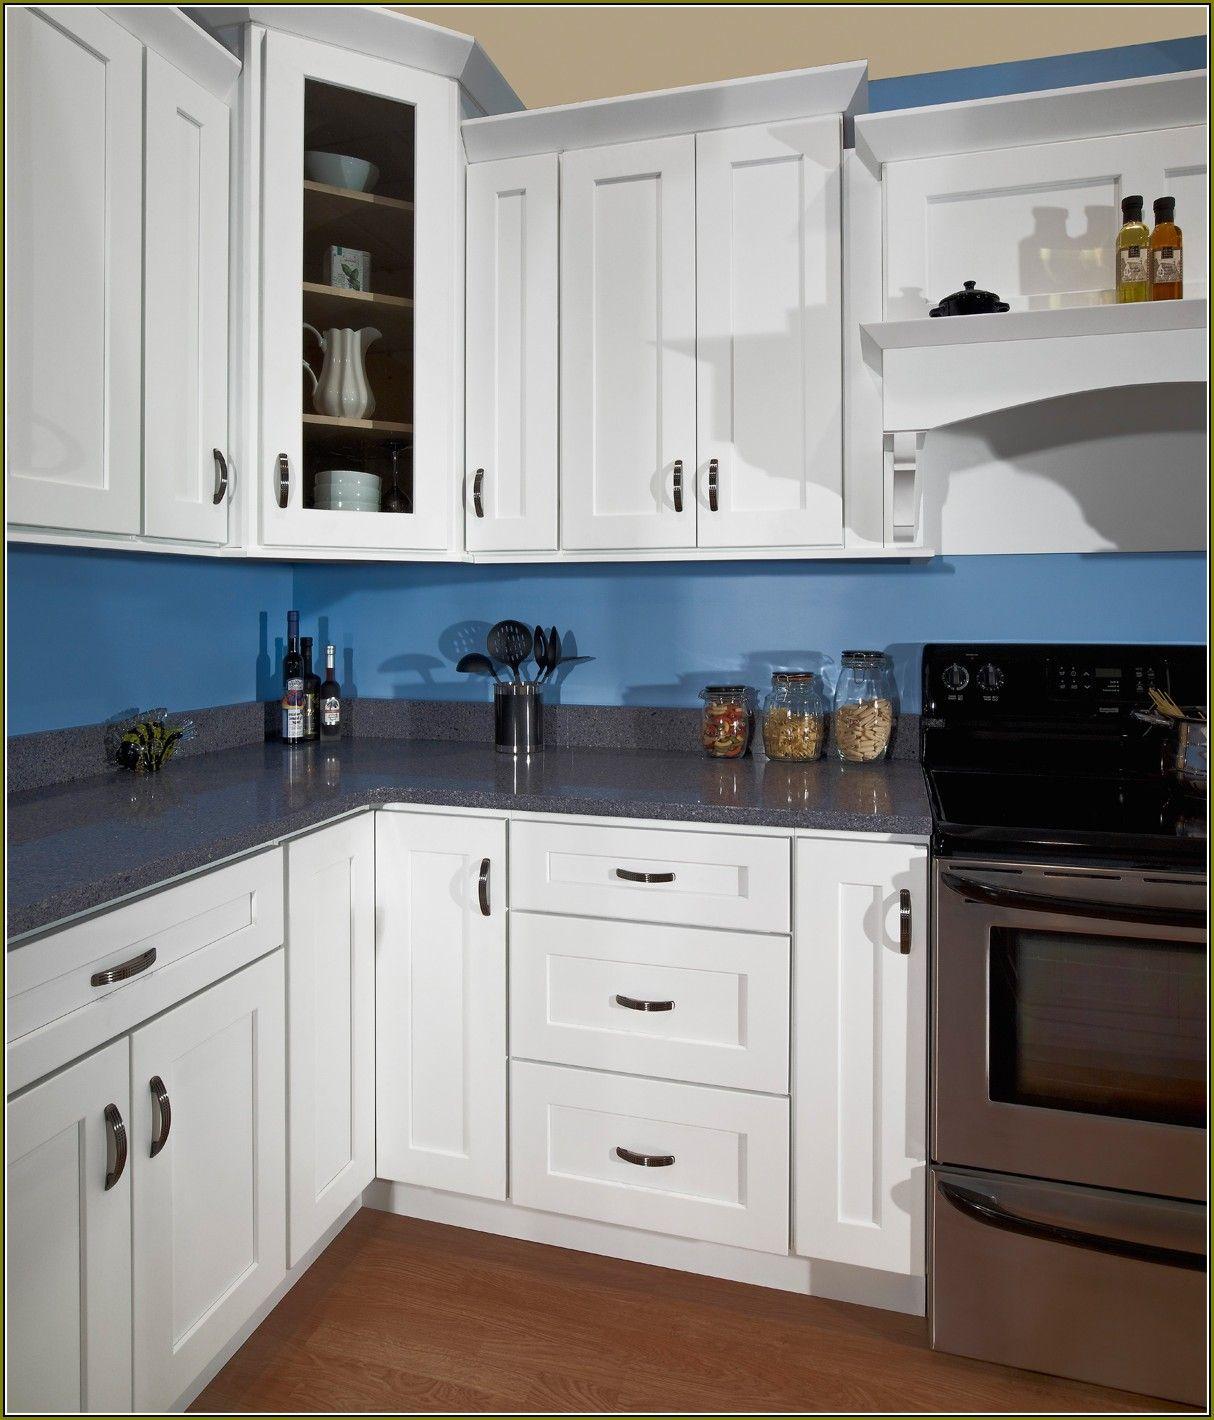 Your Home Improvements Refference White Kitchen Cabinets Handles Adorable Kitchen Door Handles Design Decoration